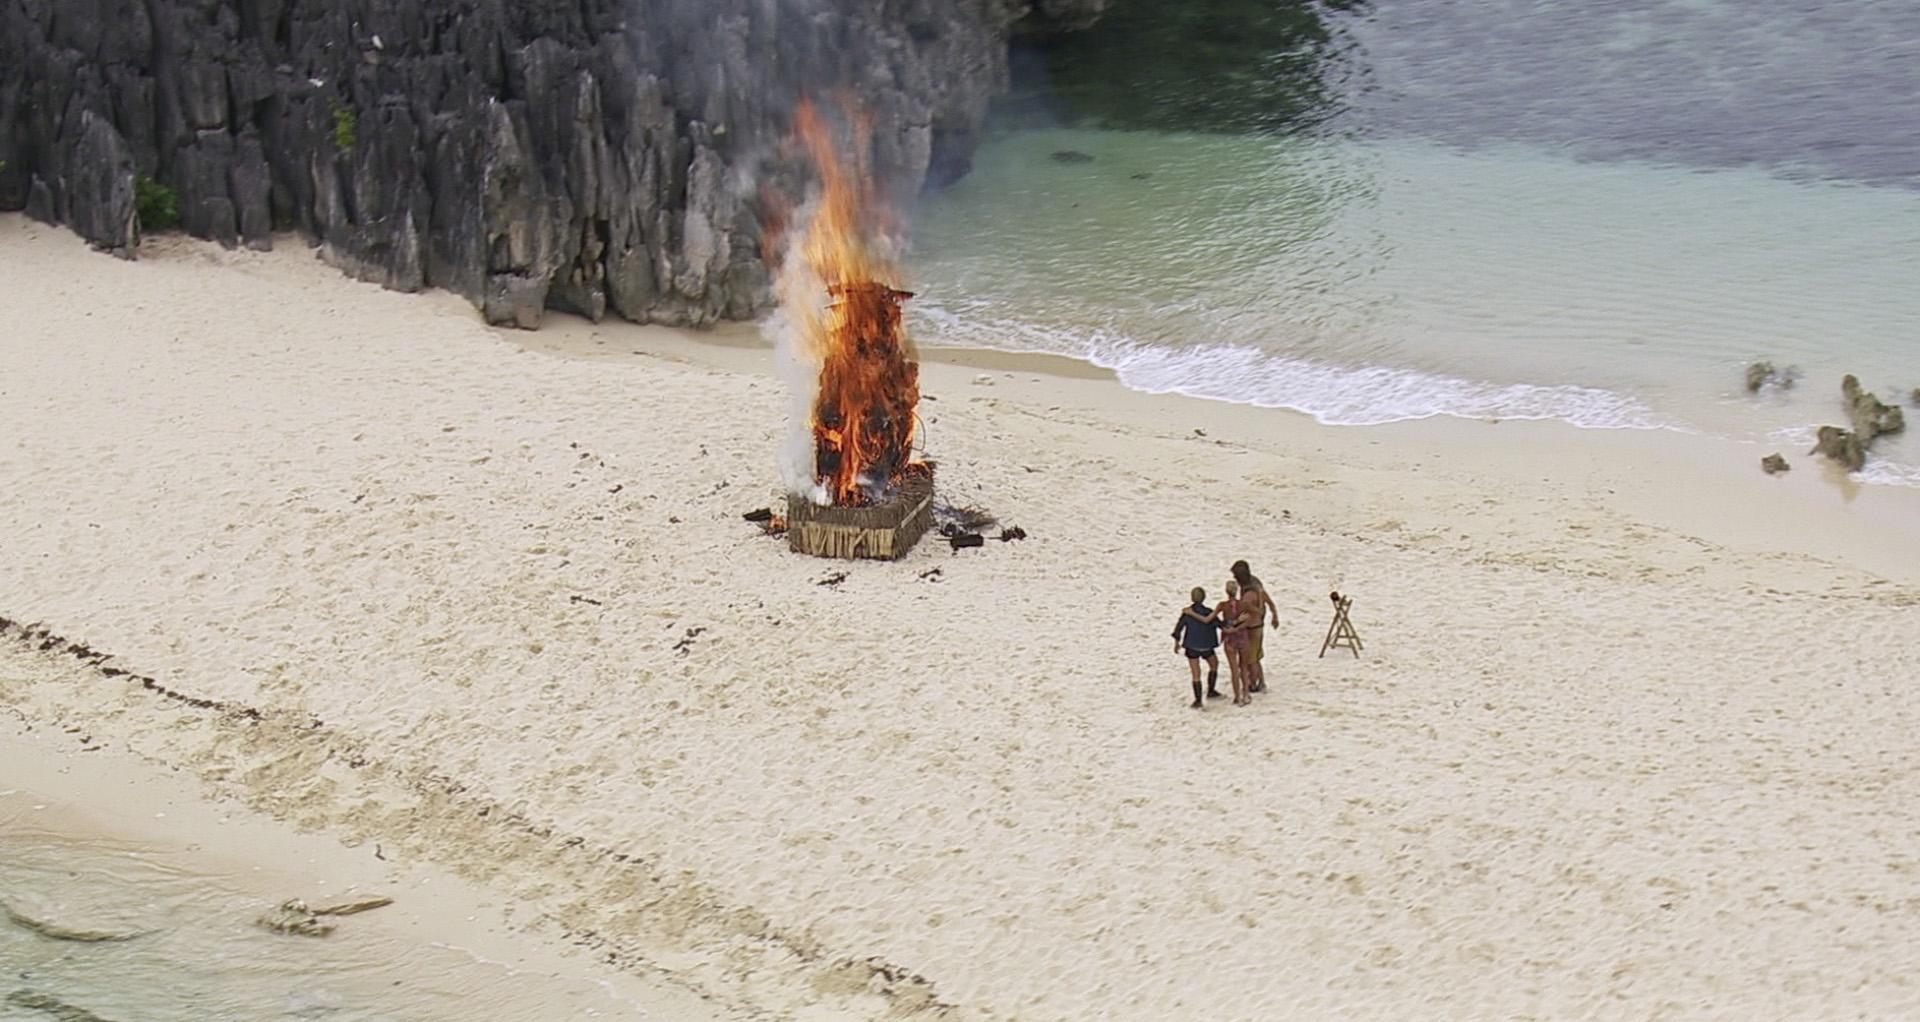 Rites of Passage walk in the Season 26 Finale